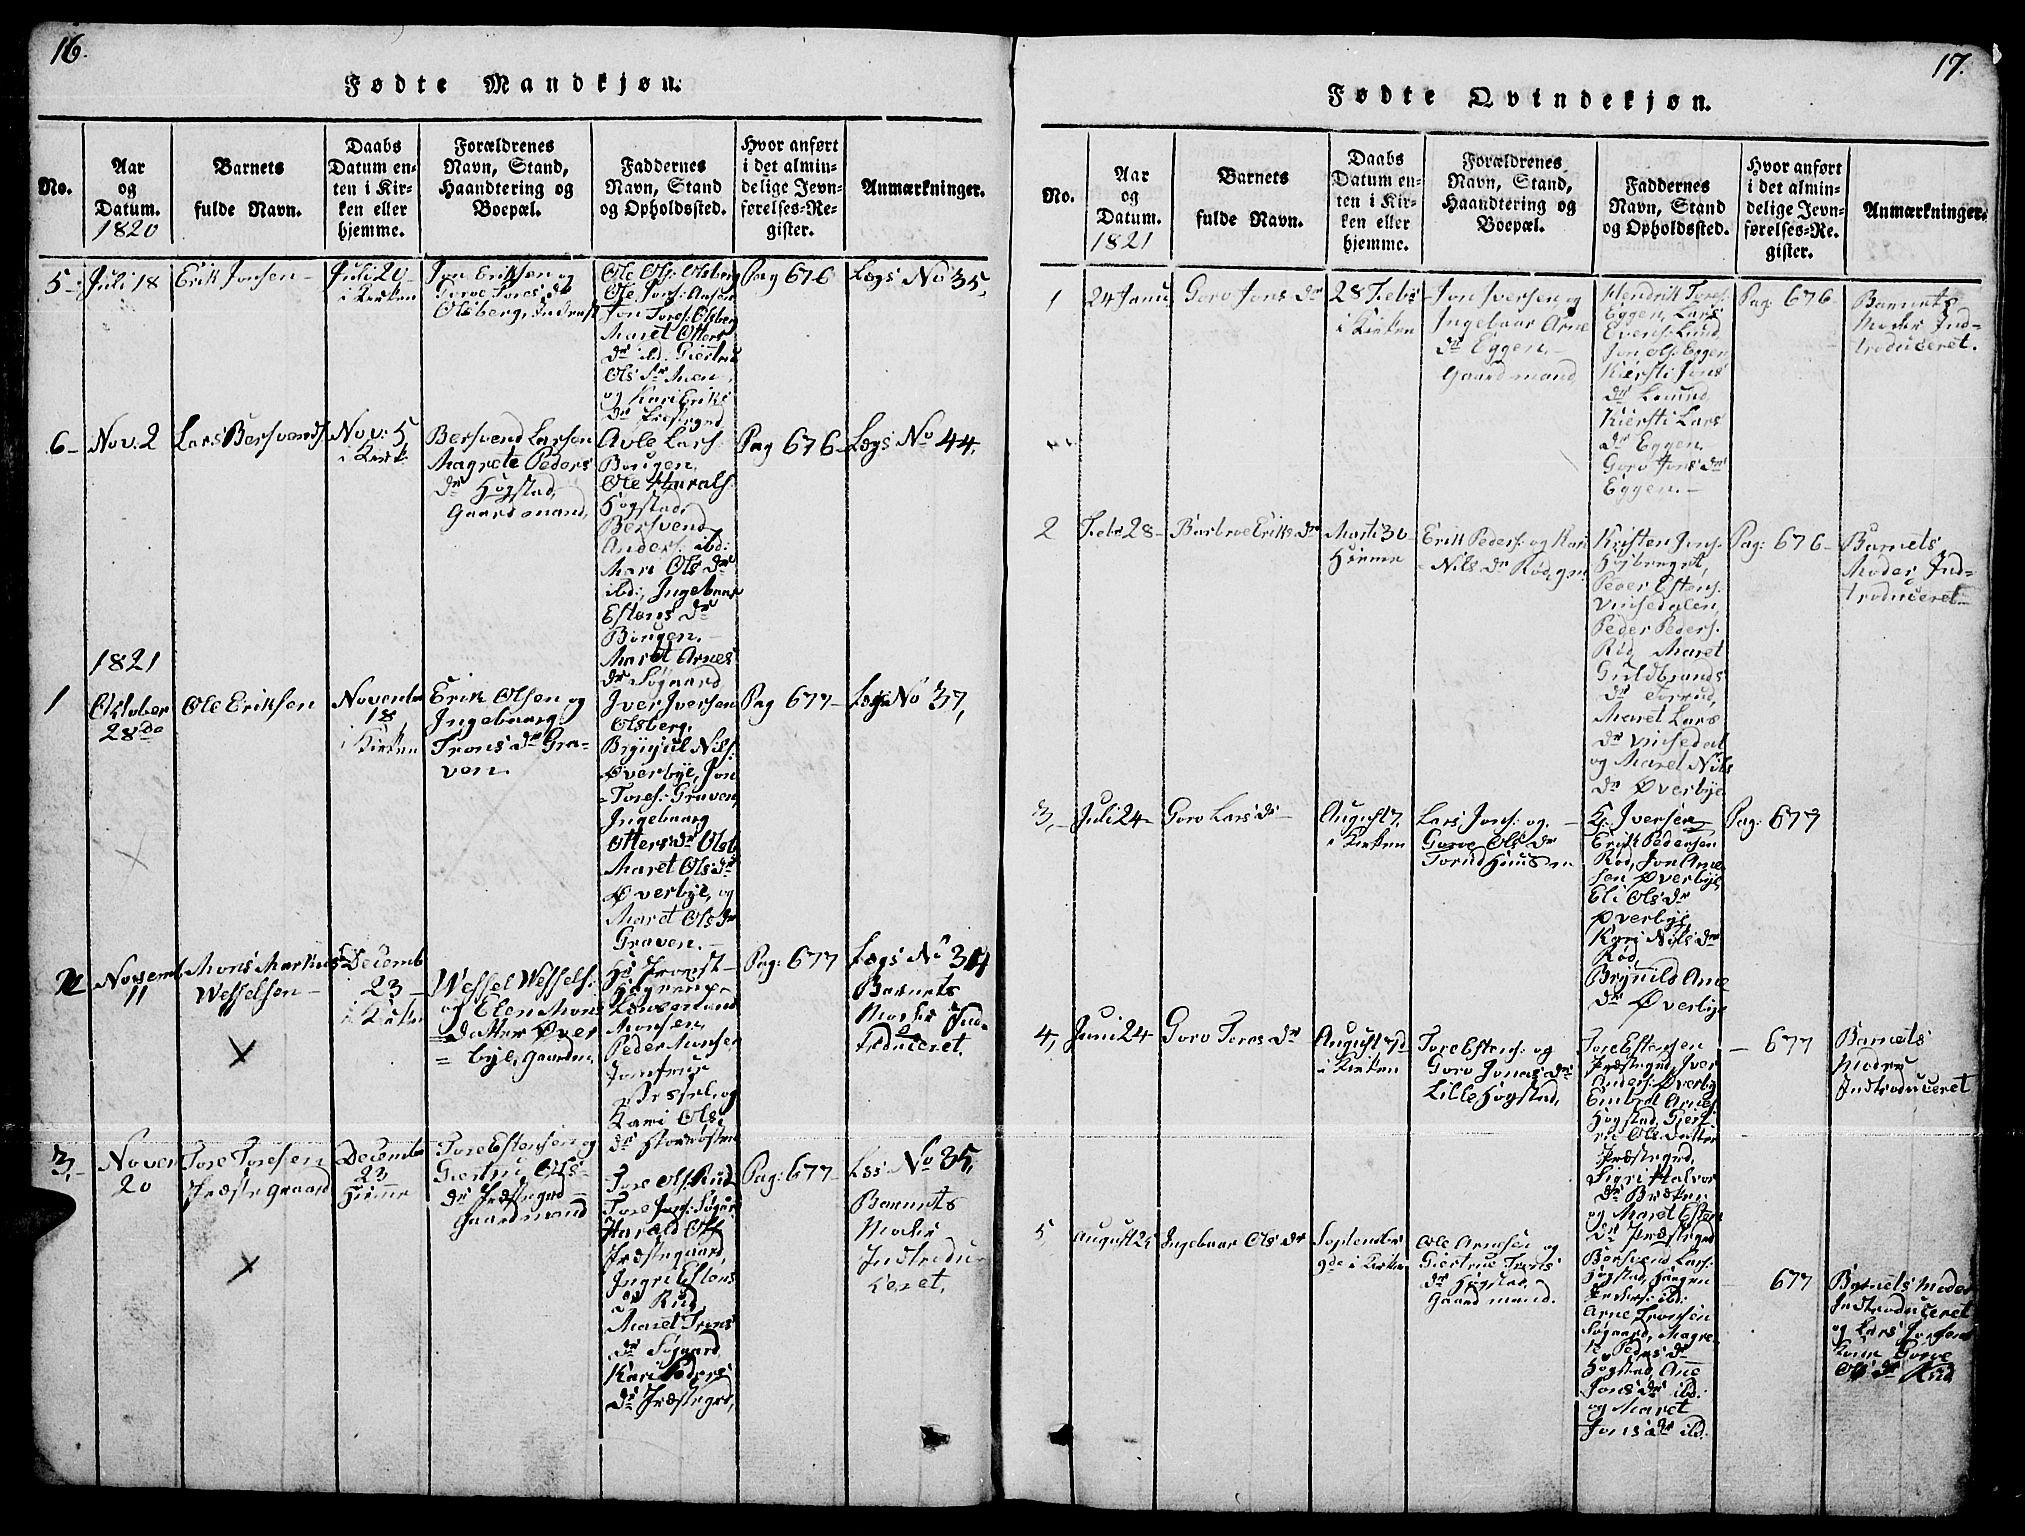 SAH, Tynset prestekontor, Klokkerbok nr. 4, 1814-1879, s. 16-17